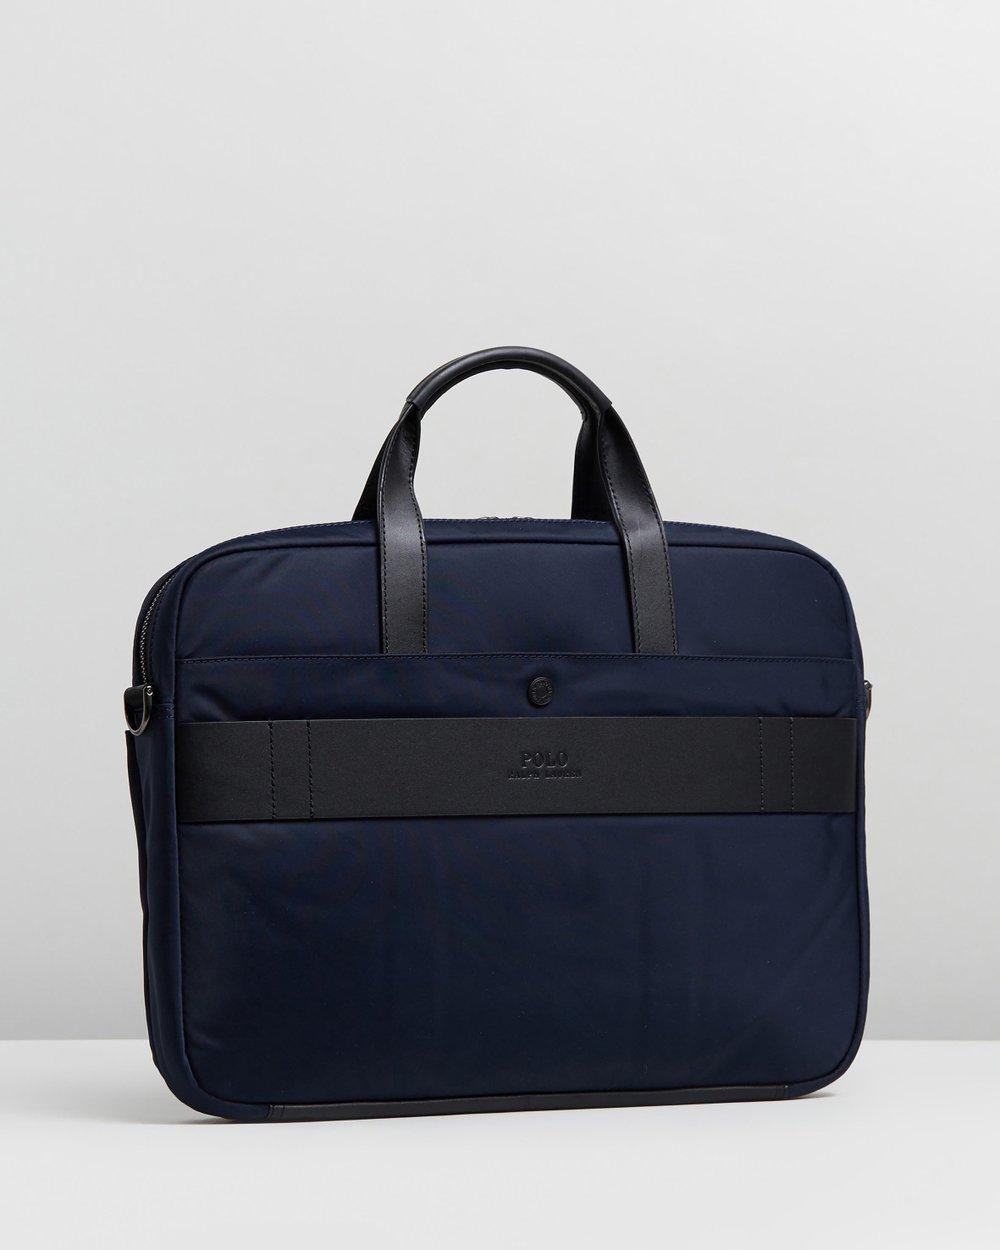 Medium Briefcase by Polo Ralph Lauren Online  3c94447923d8a